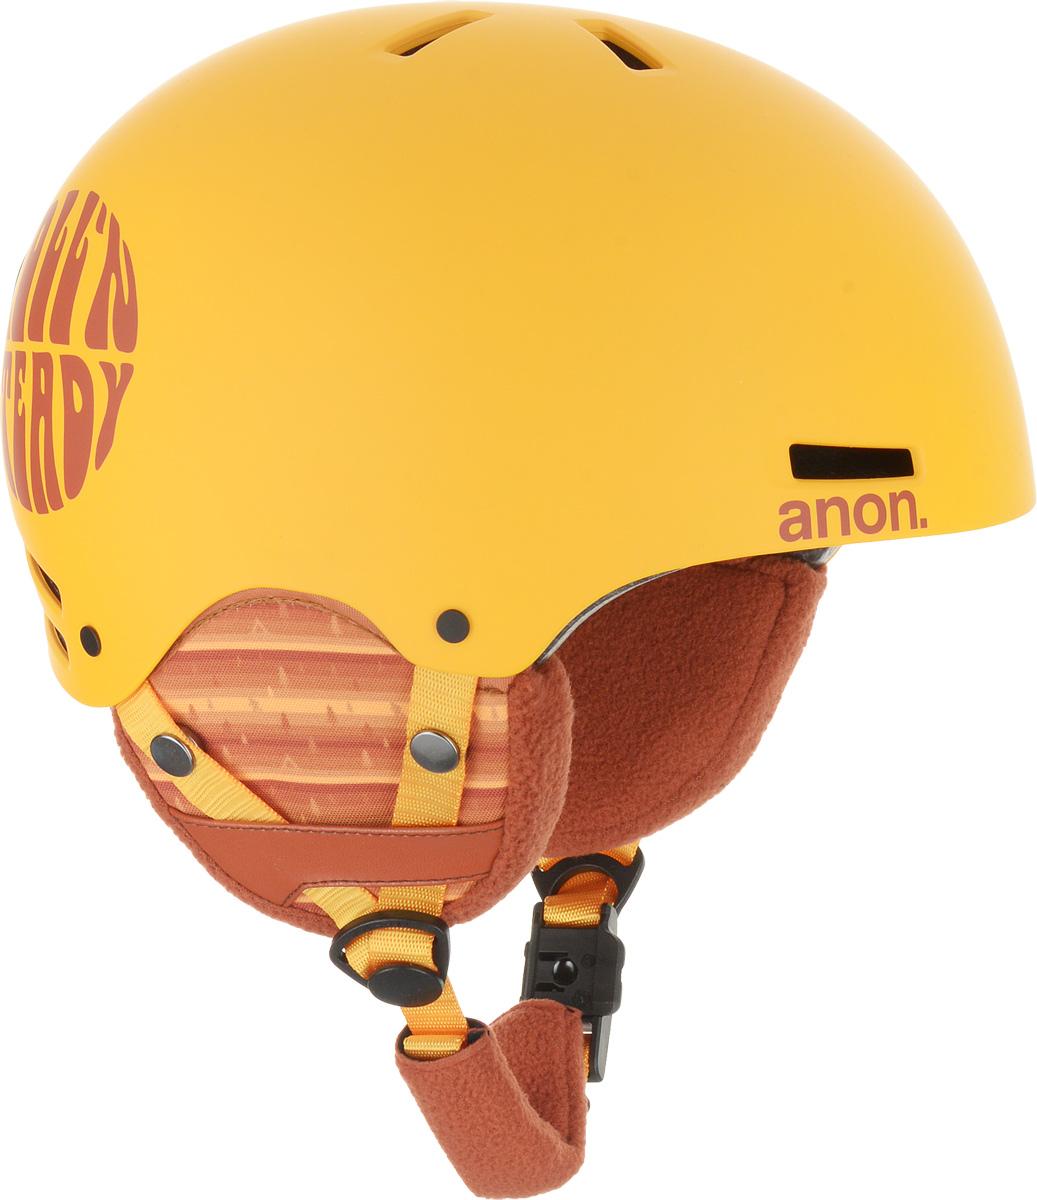 Шлем горнолыжный для мальчика Anon Rime. Размер L/XL anon маска сноубордическая anon somerset pellow gold chrome